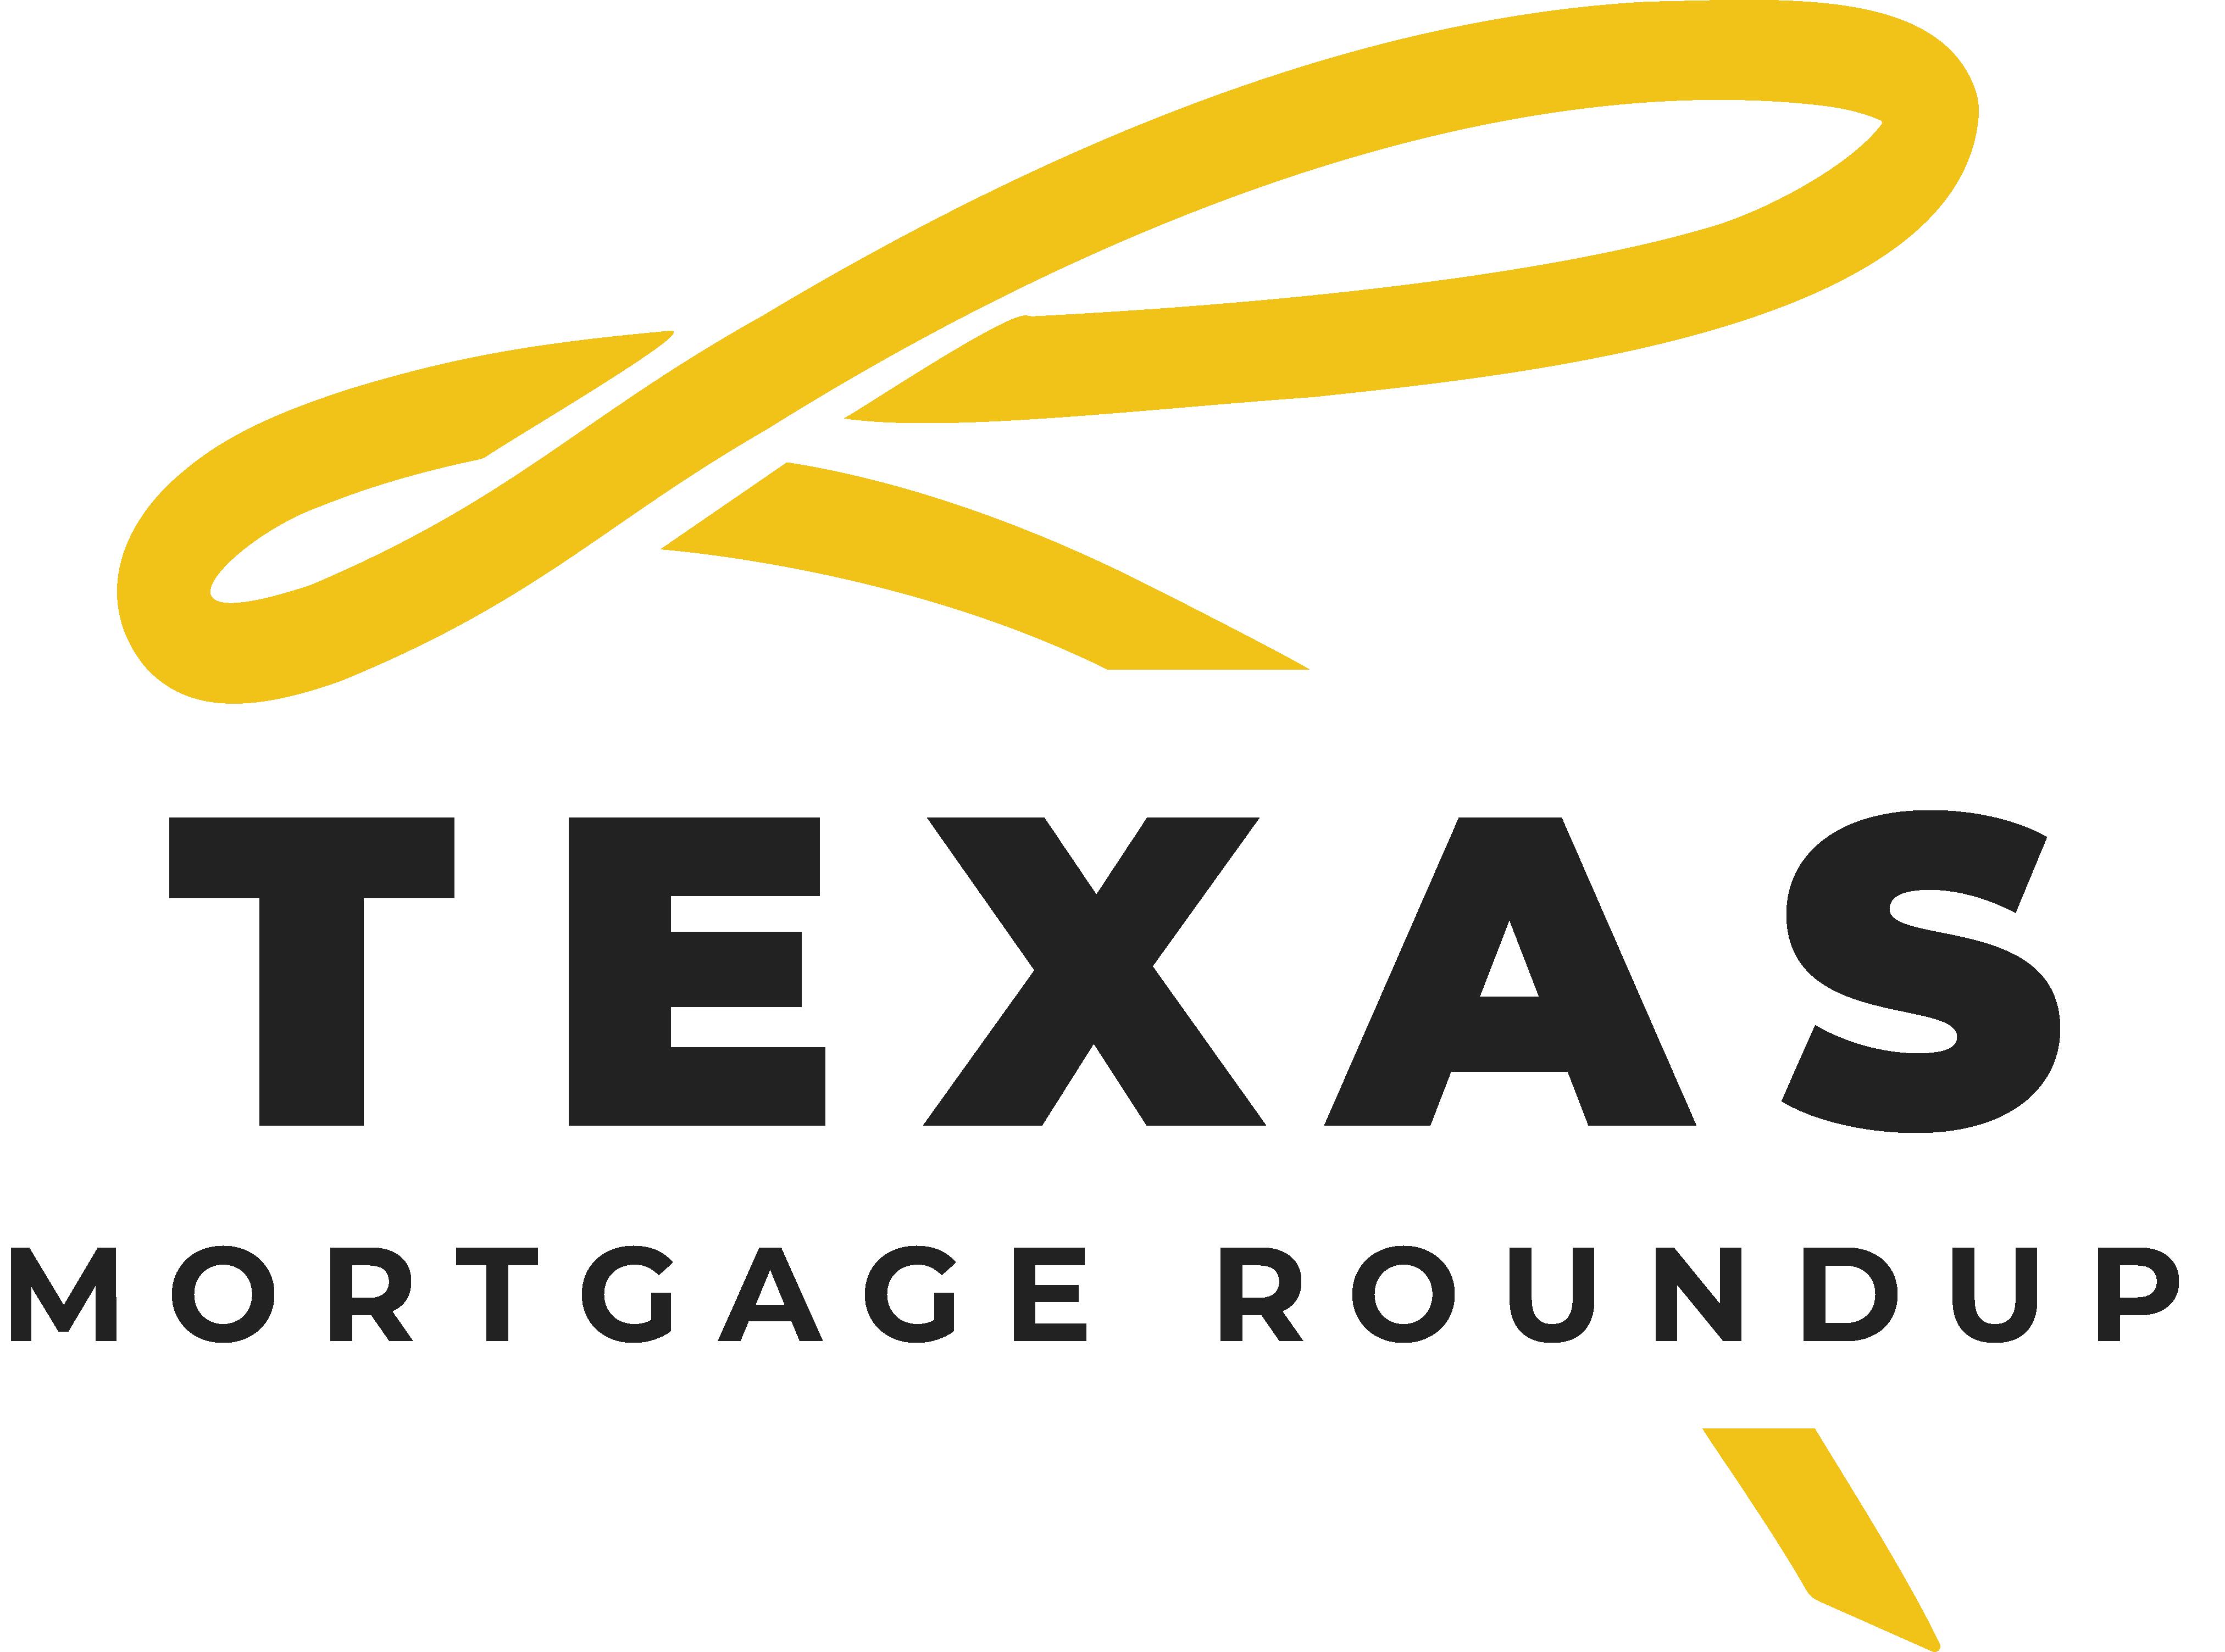 Texas Mortgage Roundup — San Antonio